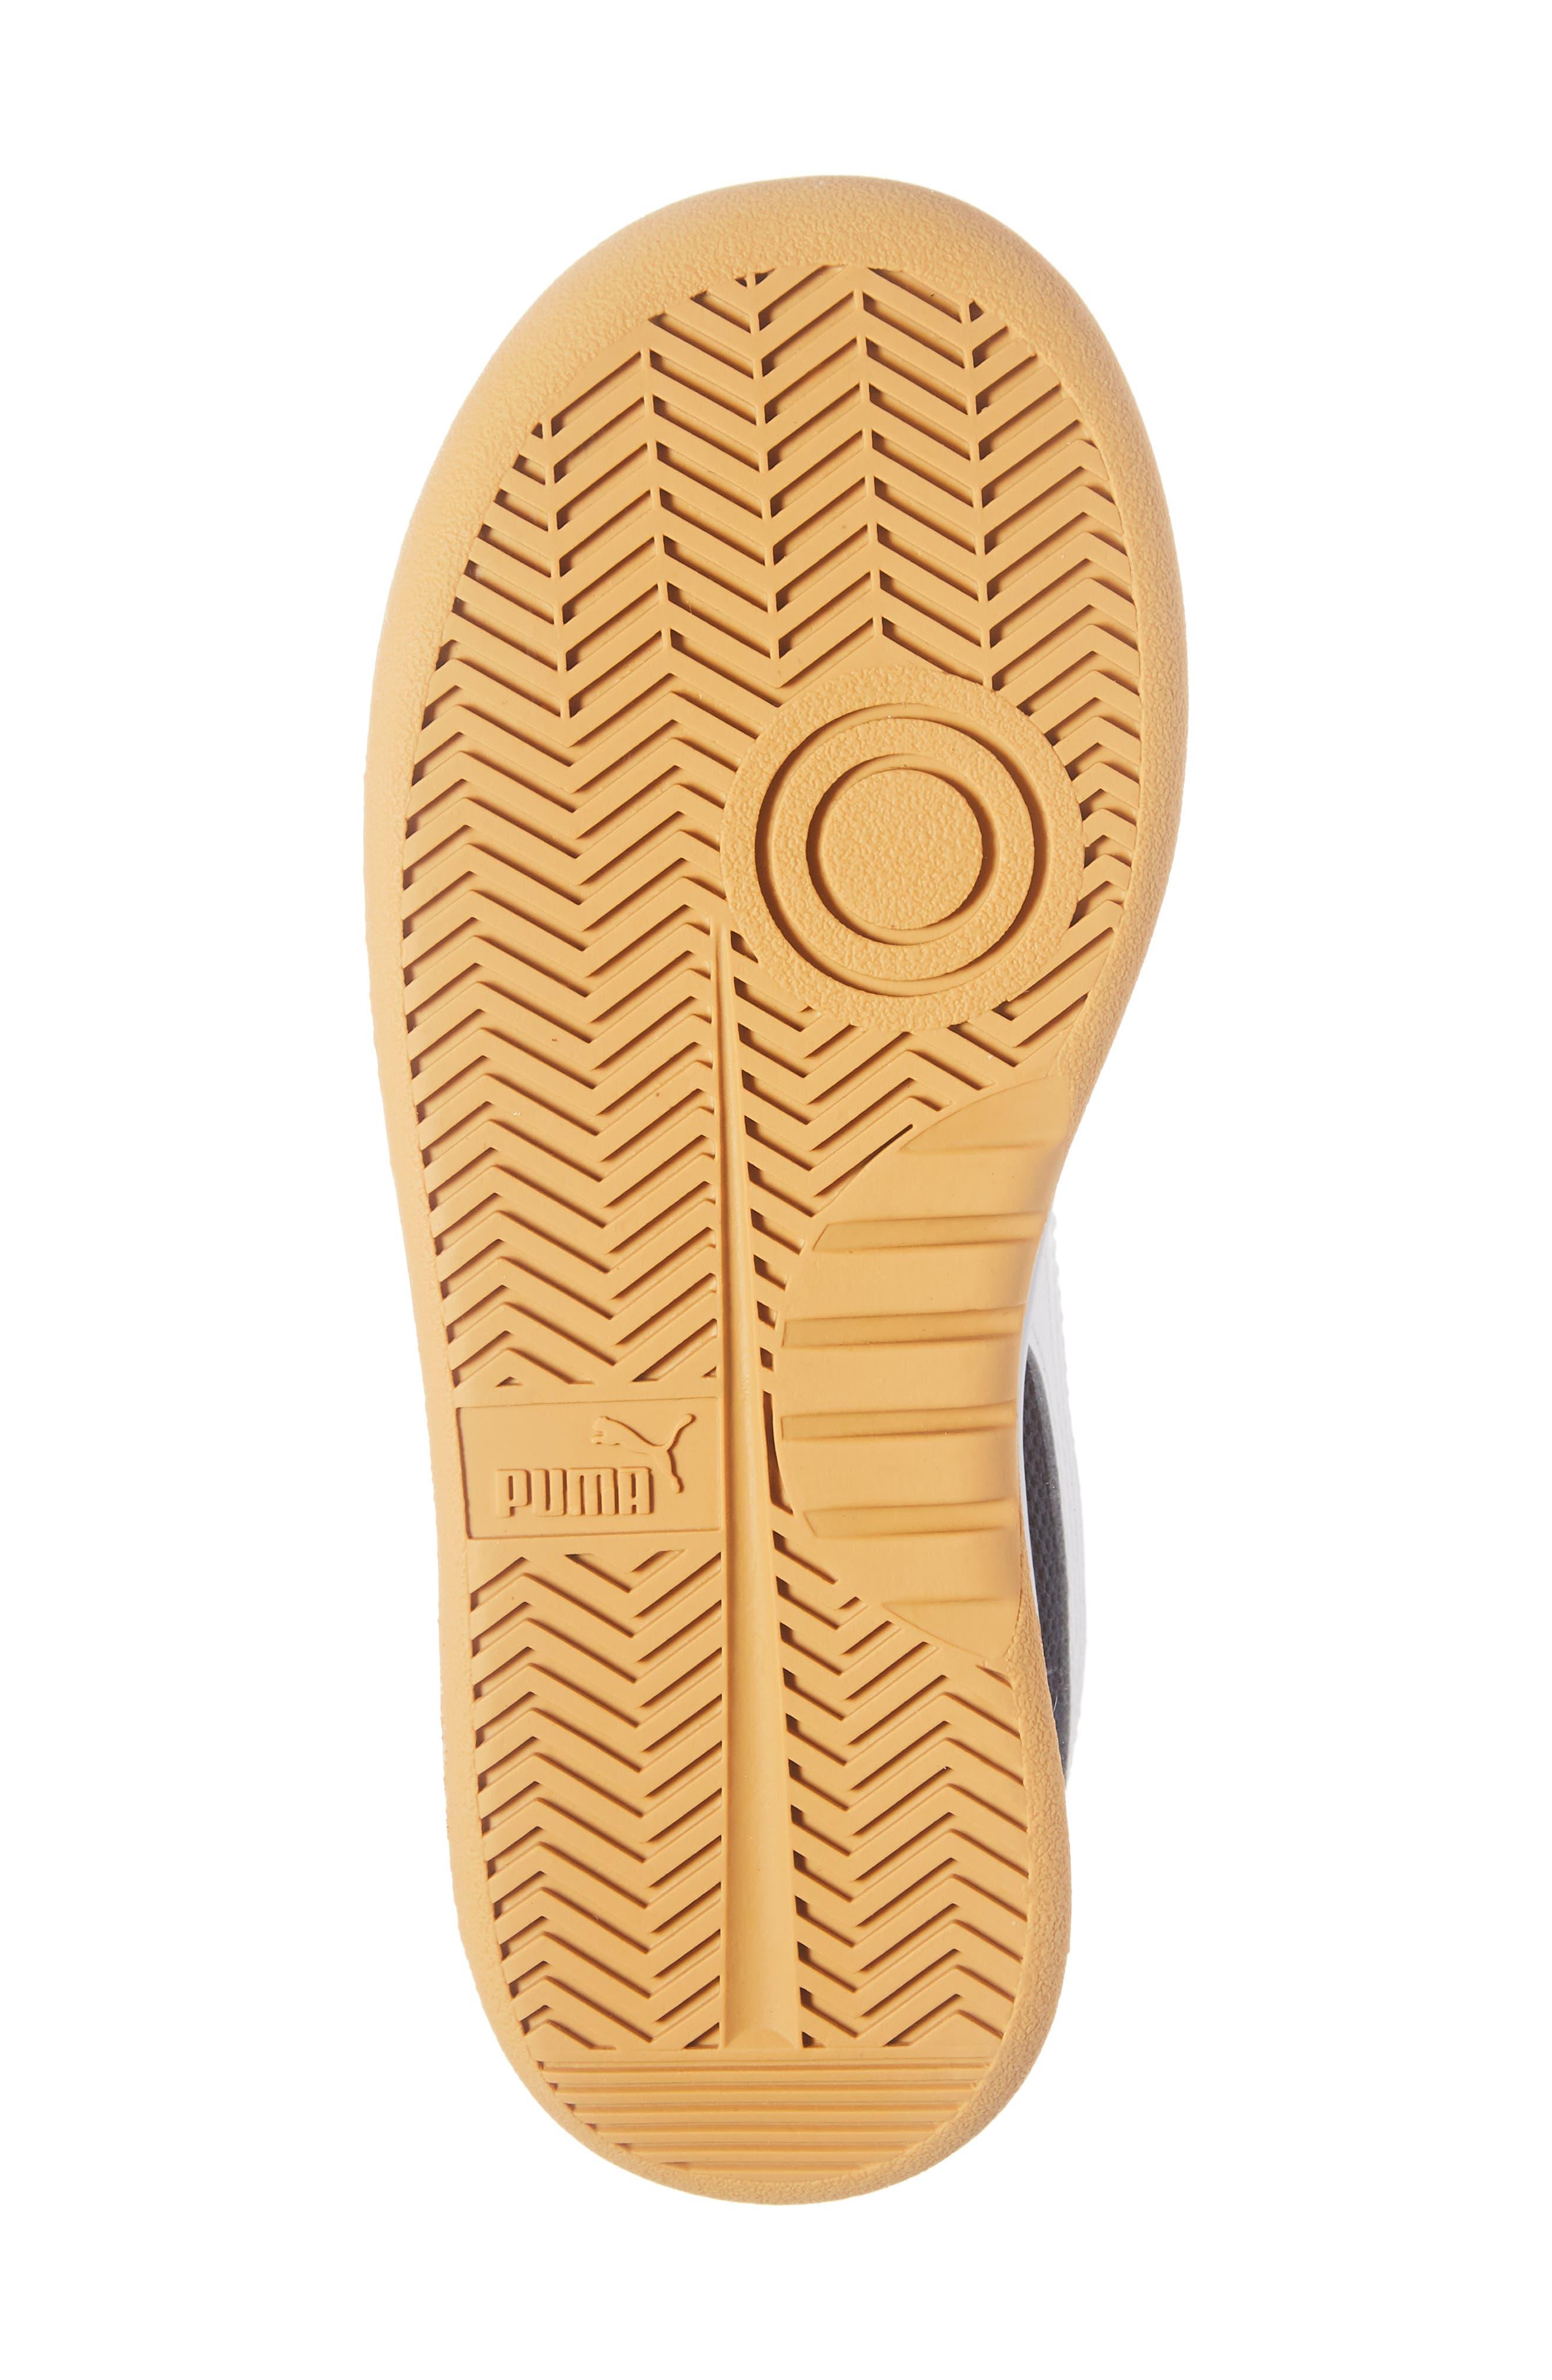 California Casual Jr. Sneaker,                             Alternate thumbnail 6, color,                             PEACOAT-PUMA WHITE-GOLD